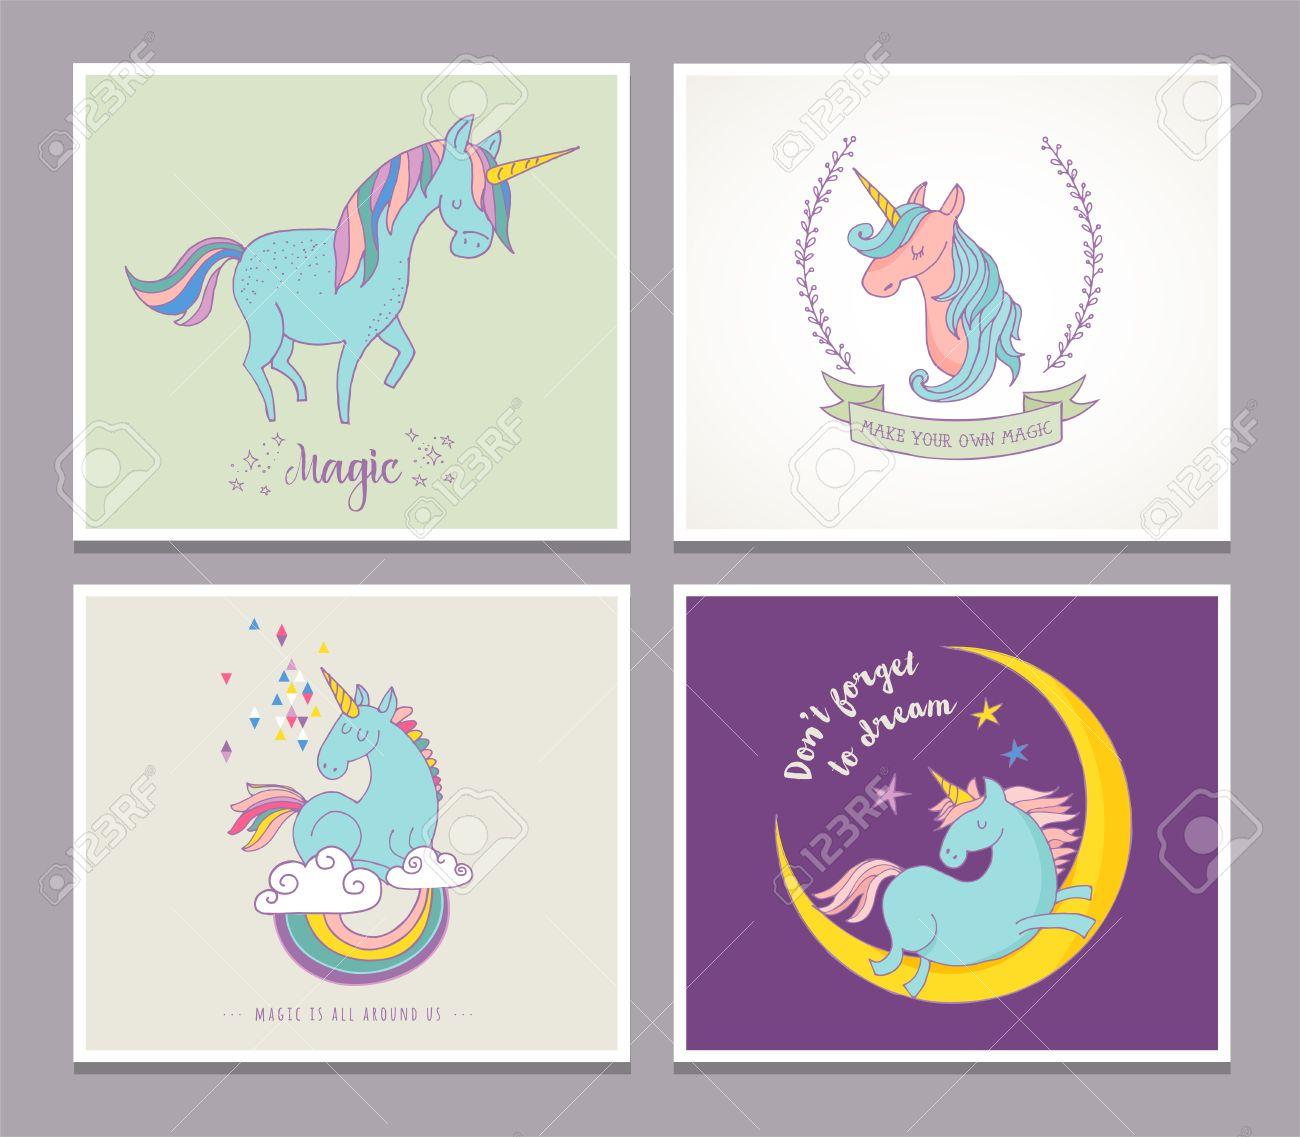 Magic Cute Unicorns And Rainbow Birthday Cards Greetings Invite Stock Vector